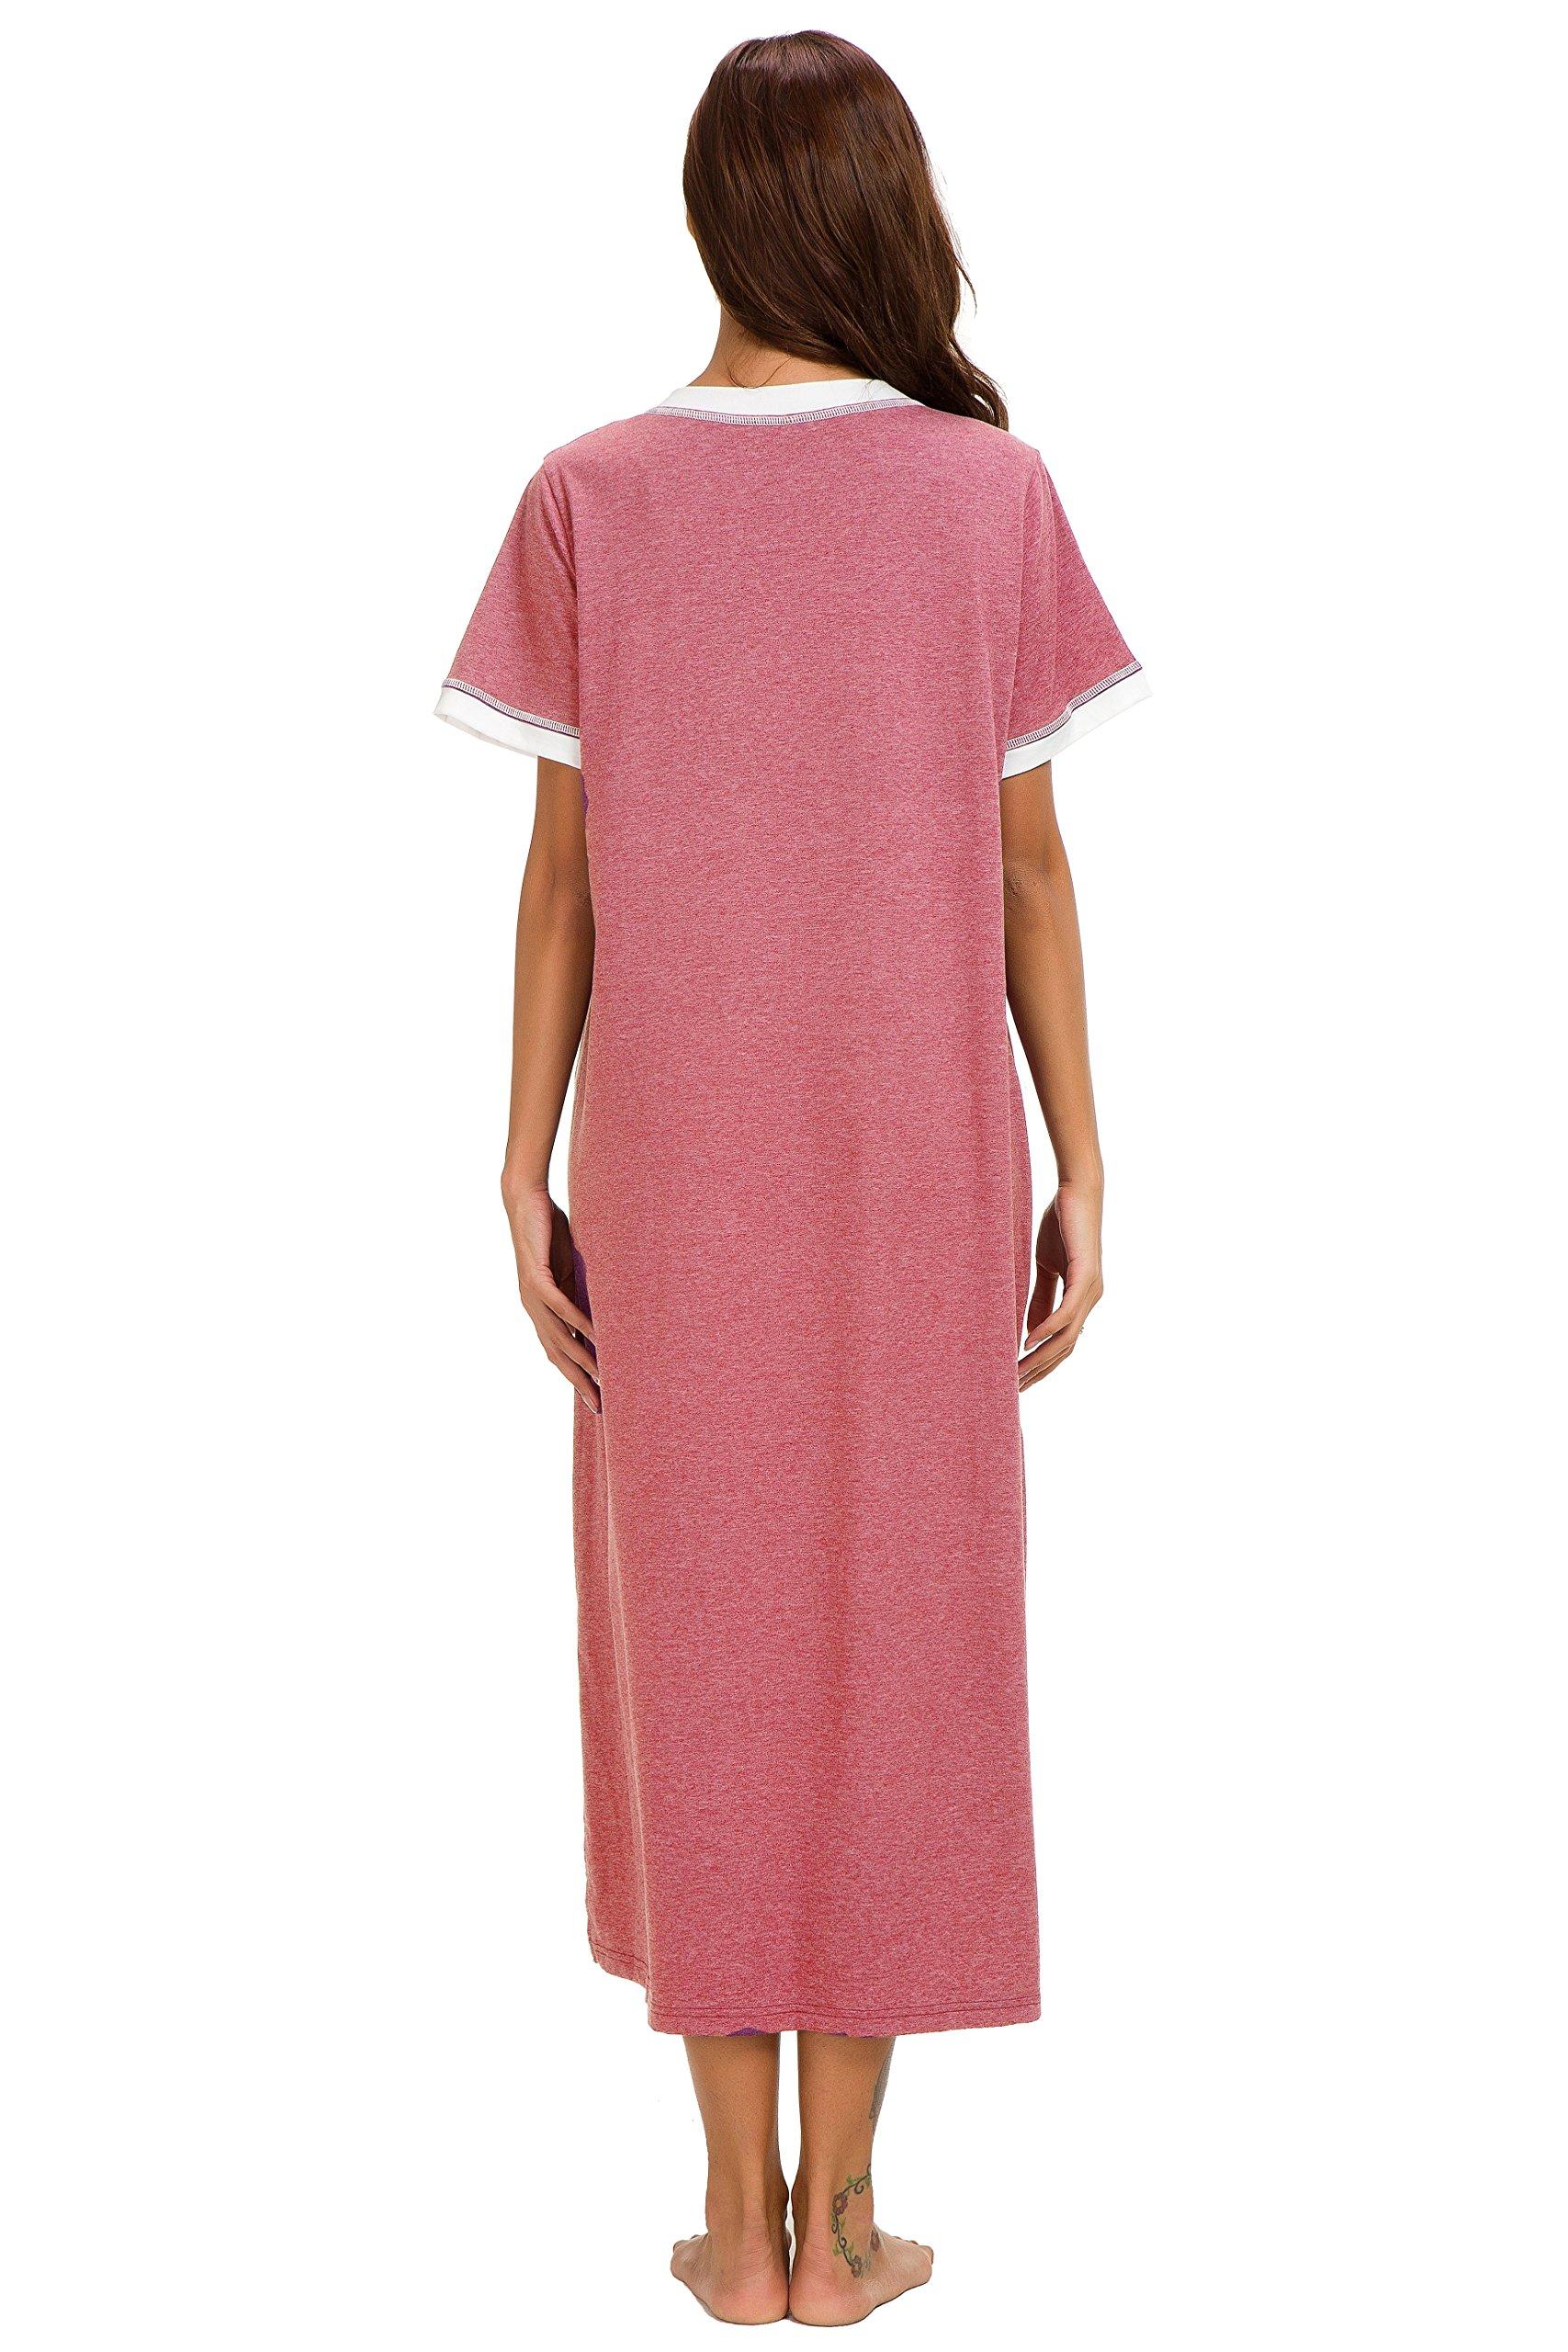 Aviier Supersoft Maxi Sleepshirt with Pockets, Nightgowns for Women Short Sleeve Cotton Nightshirts Sleepwear (XXL, Red) by Aviier (Image #6)